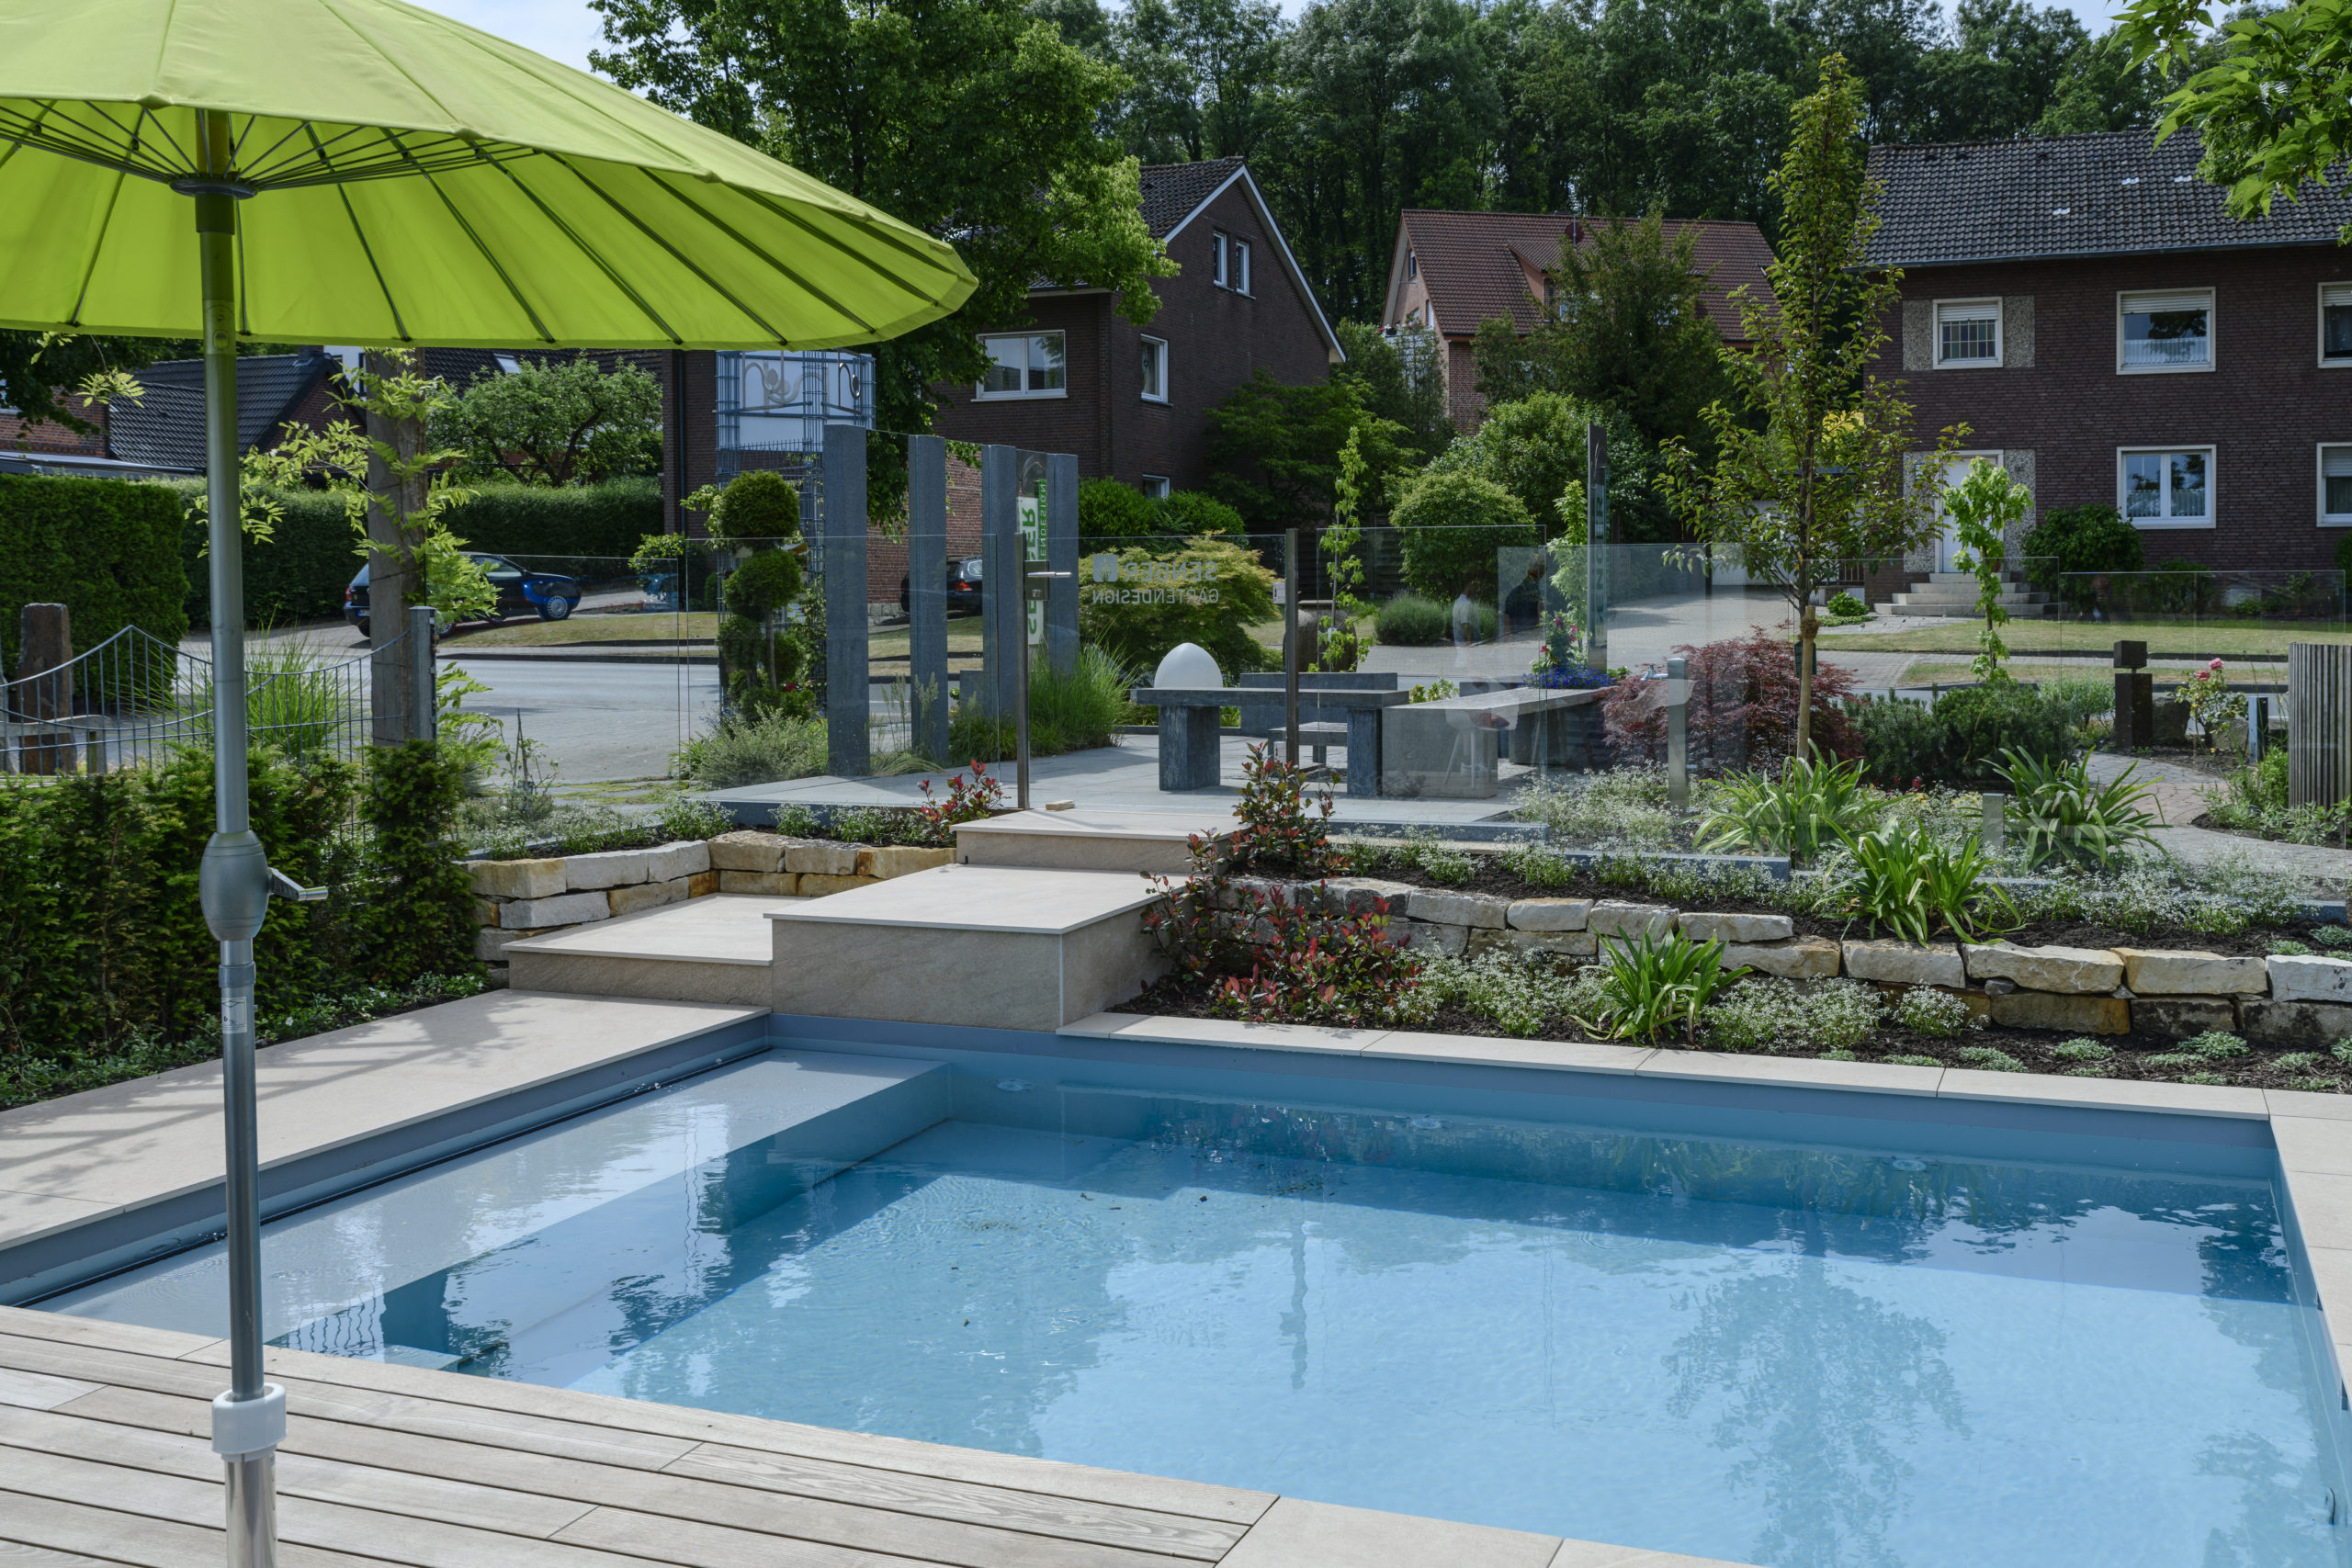 Pool trifft Gartendesign